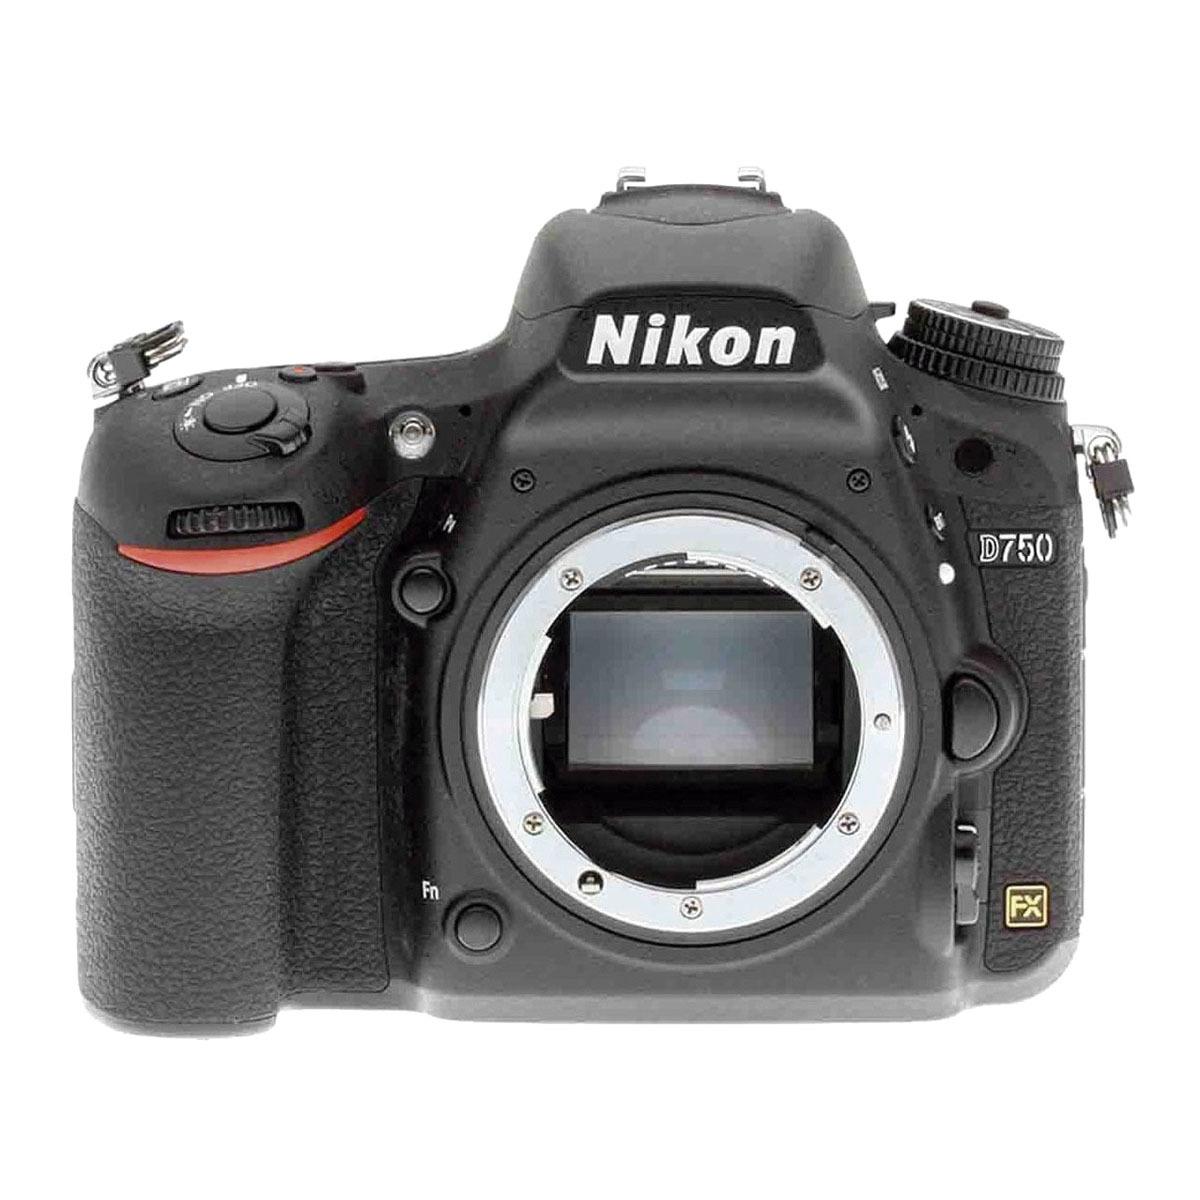 Cámara réflex Nikon D750 Cuerpo